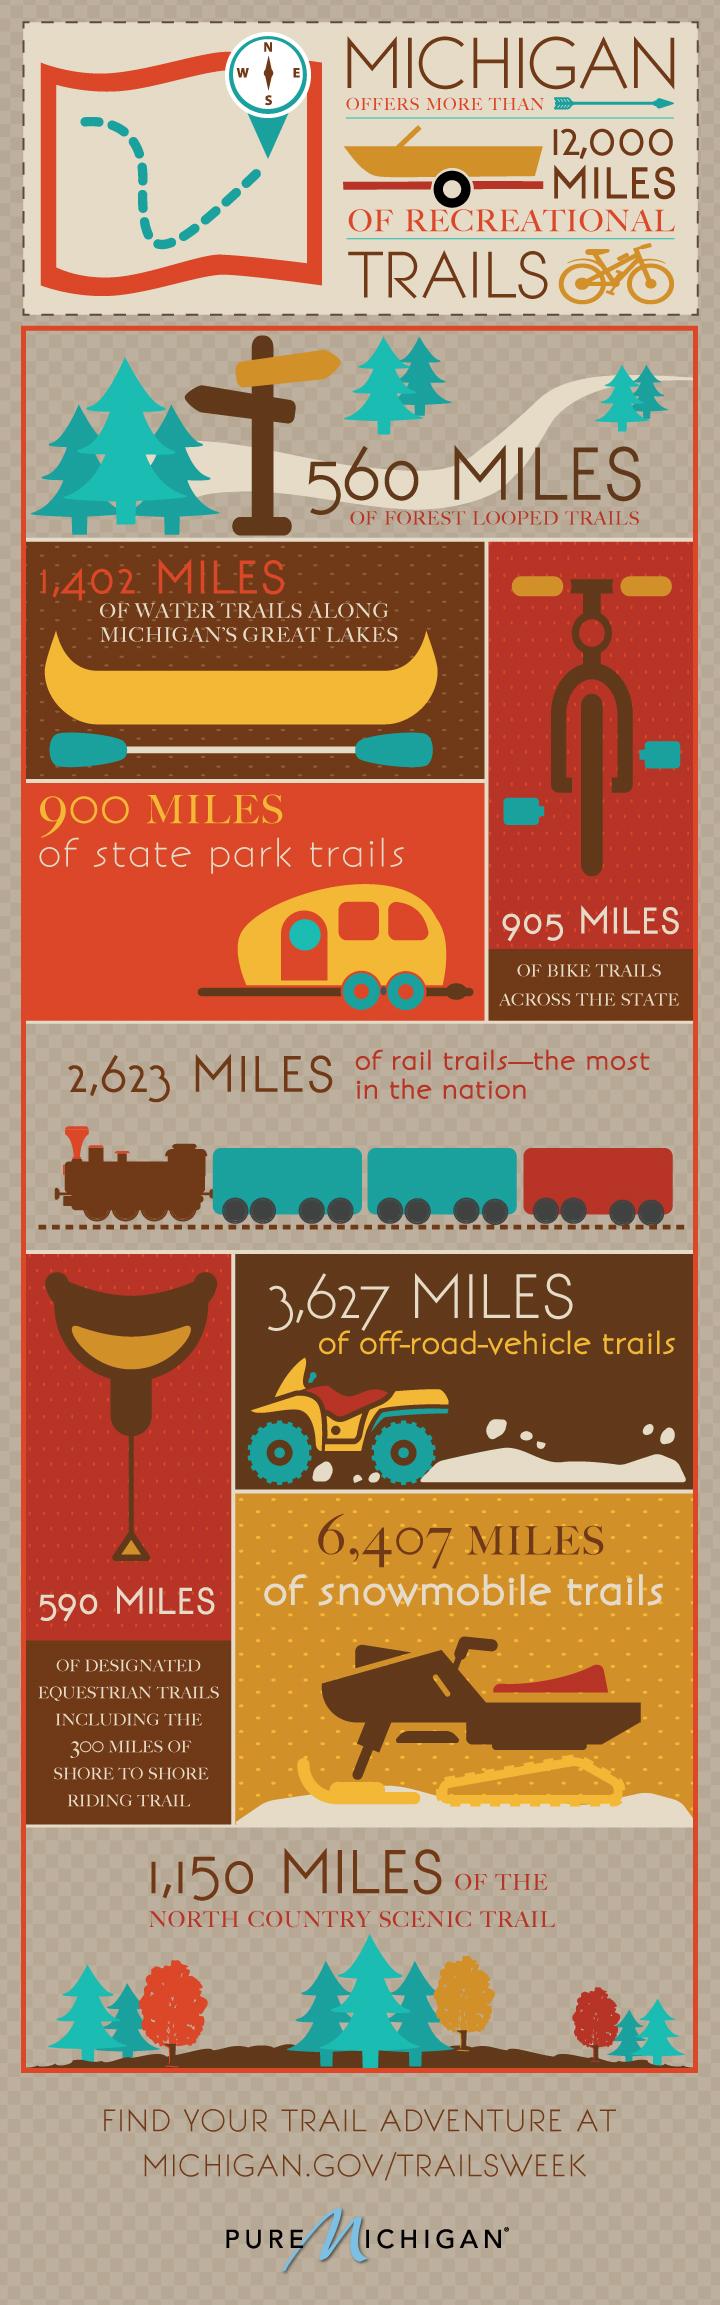 Trails_Info_435083_7